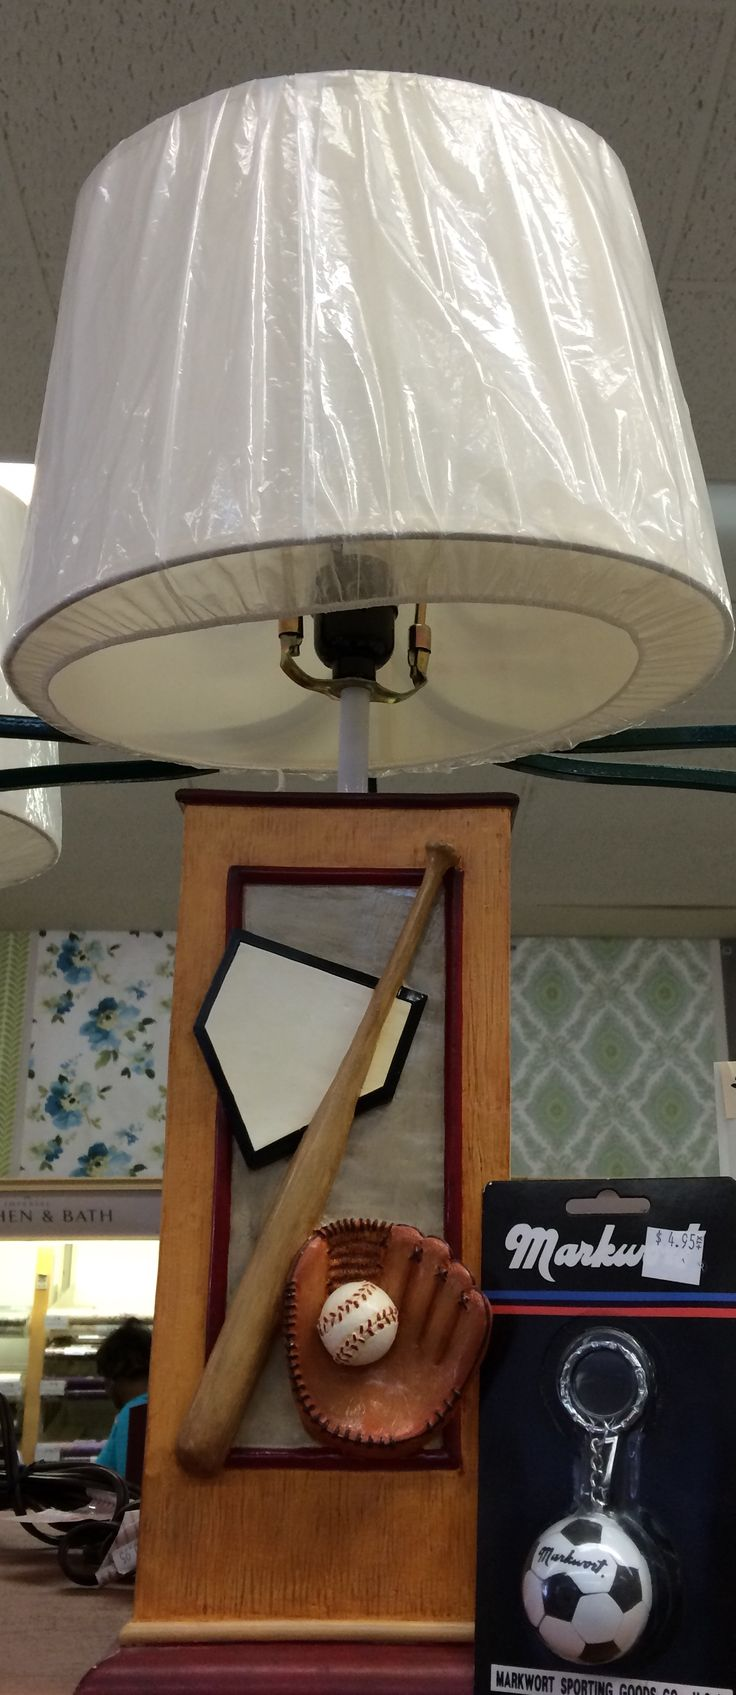 Holiday gift idea:  Sports themed lamp.  http://lelandswallpaper.com/store/Sports%20Related/Baseball/Accessories/Item:Show:Baseball%20Lamp##giftideas #baseball